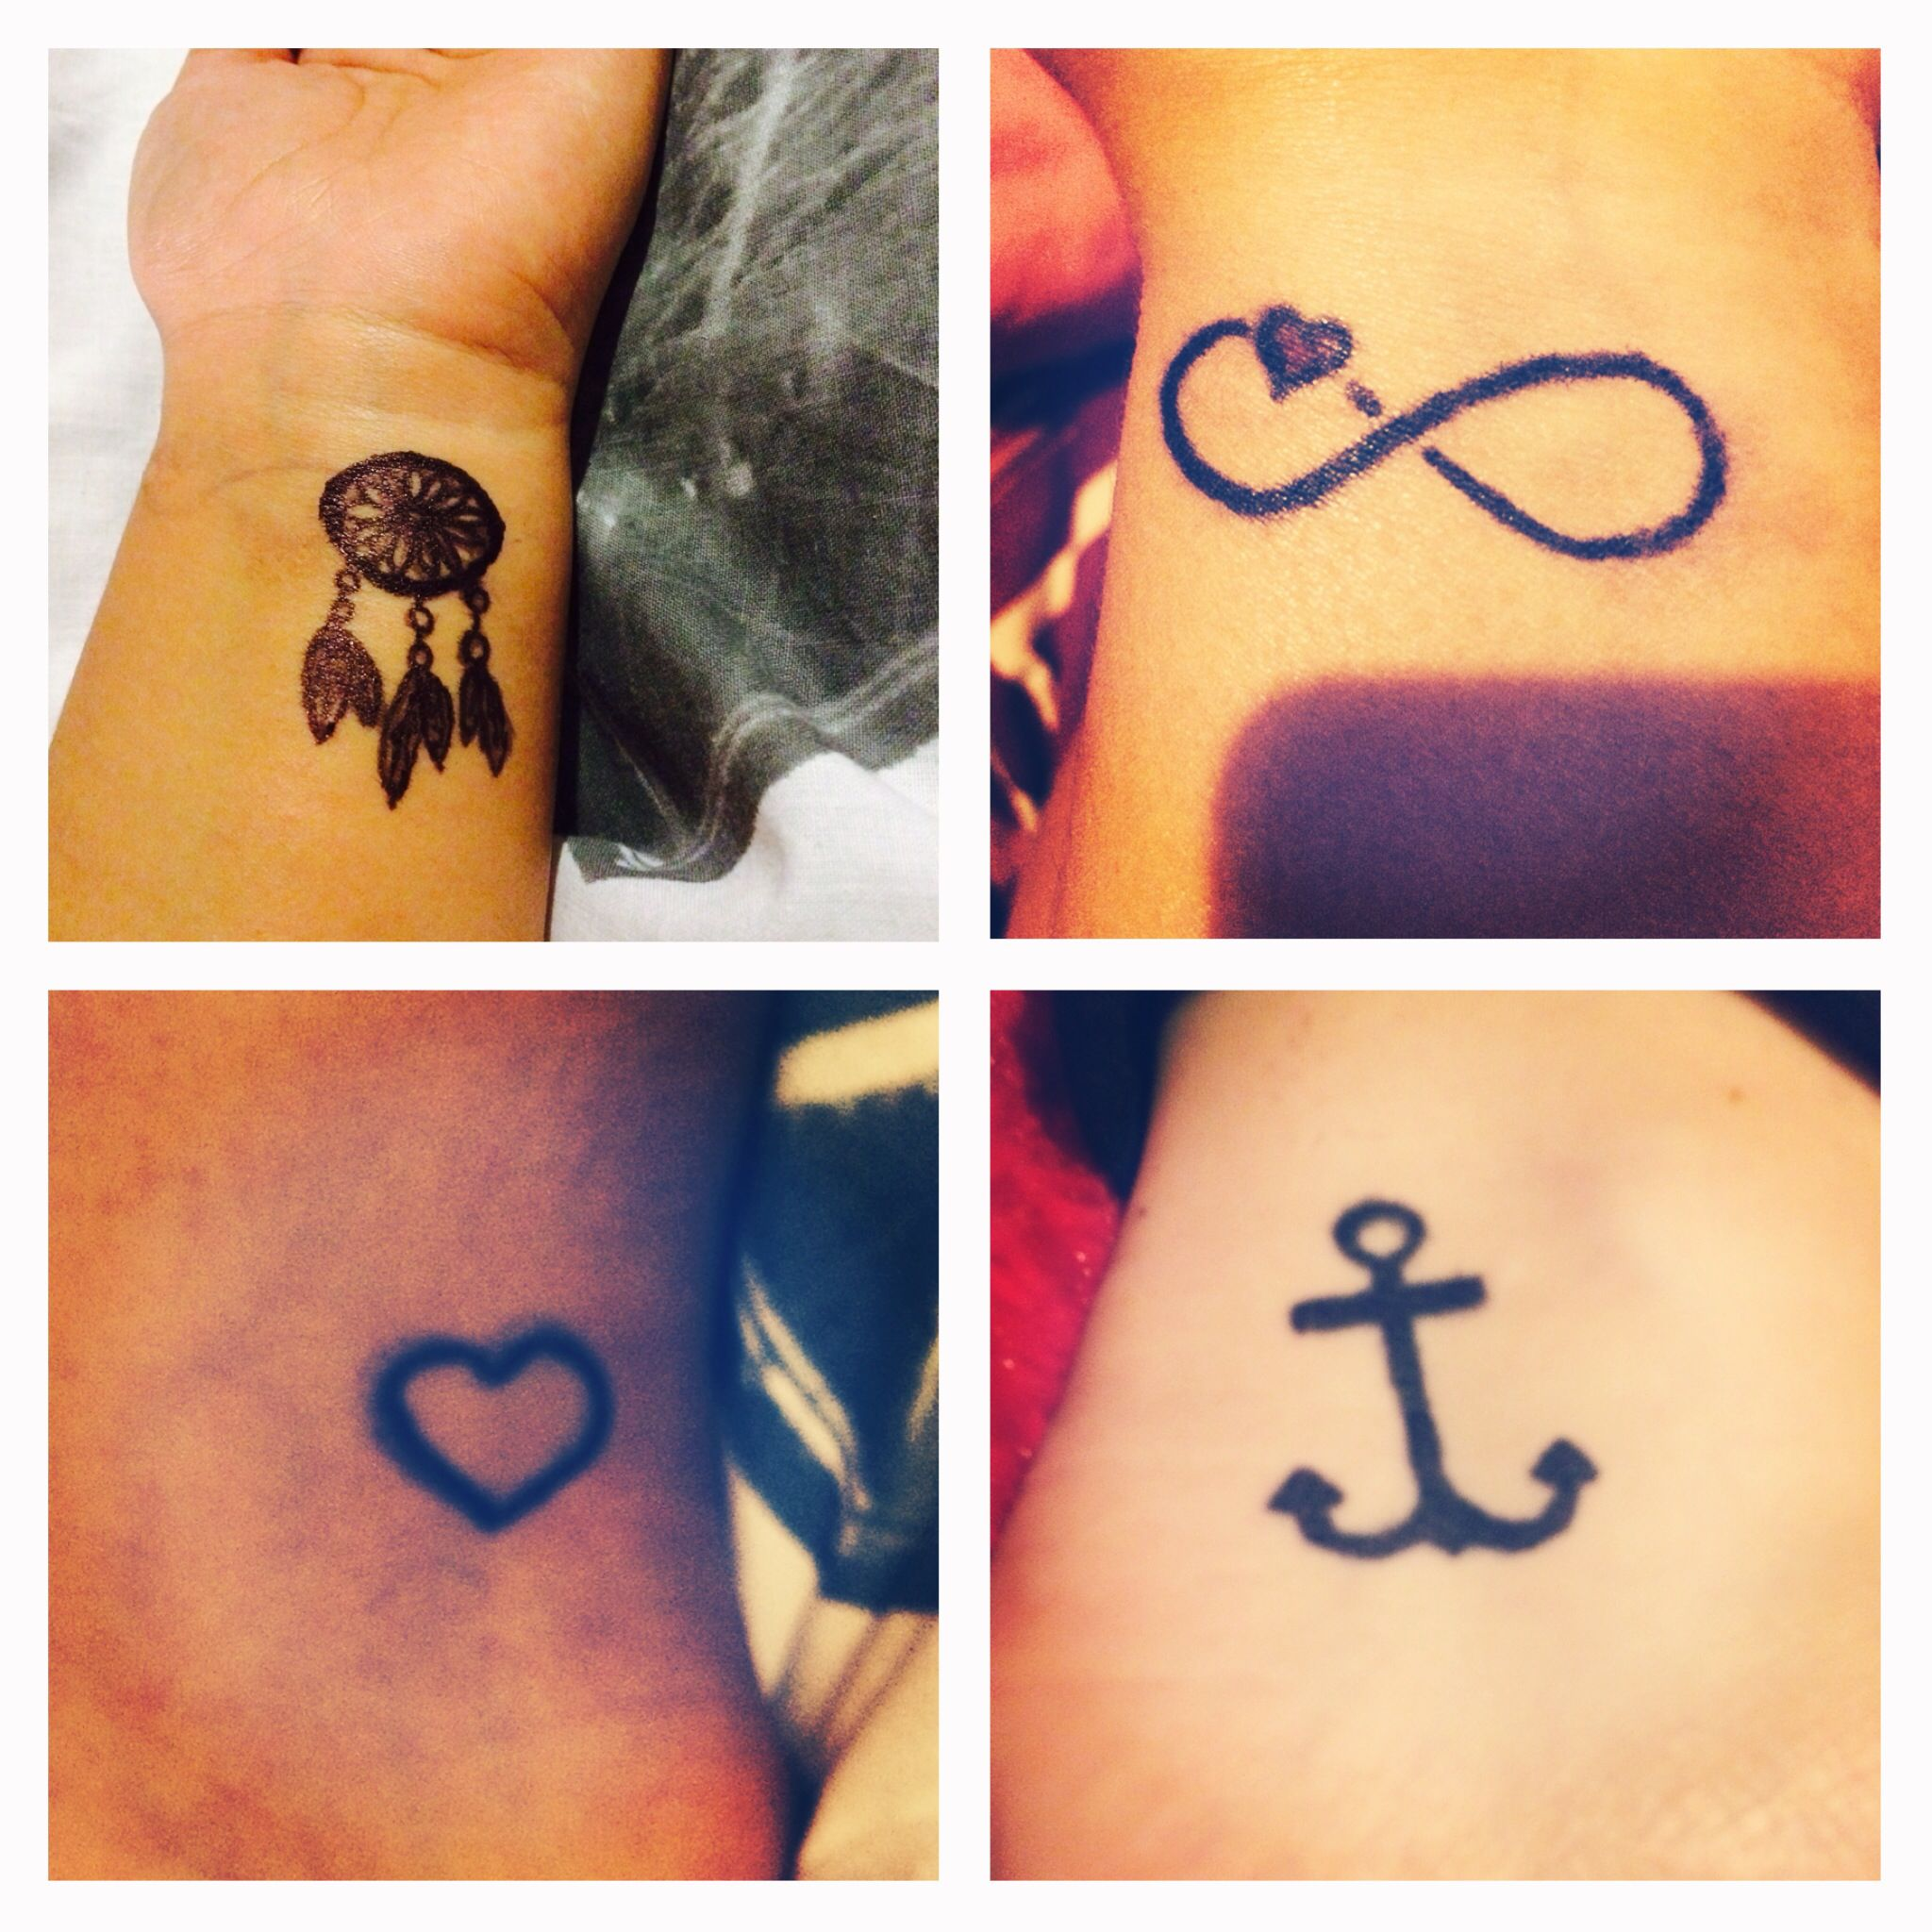 Temporary Tattoos Sharpie Pen Baby Powder And Hairspray Tattoo